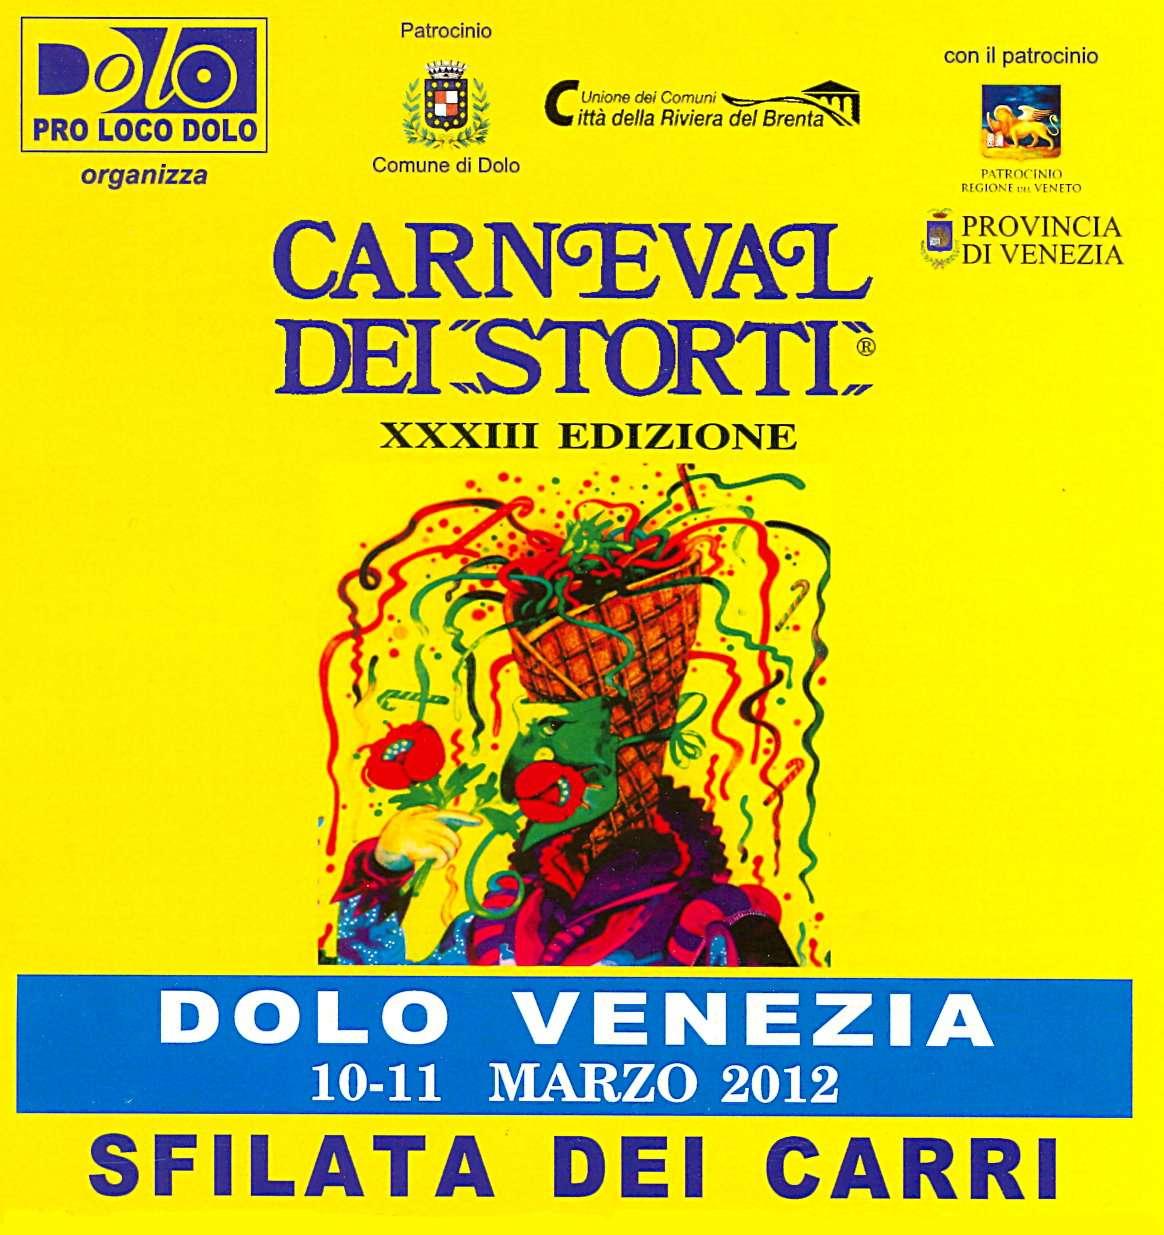 logo carnevale 2012 x sito.jpg